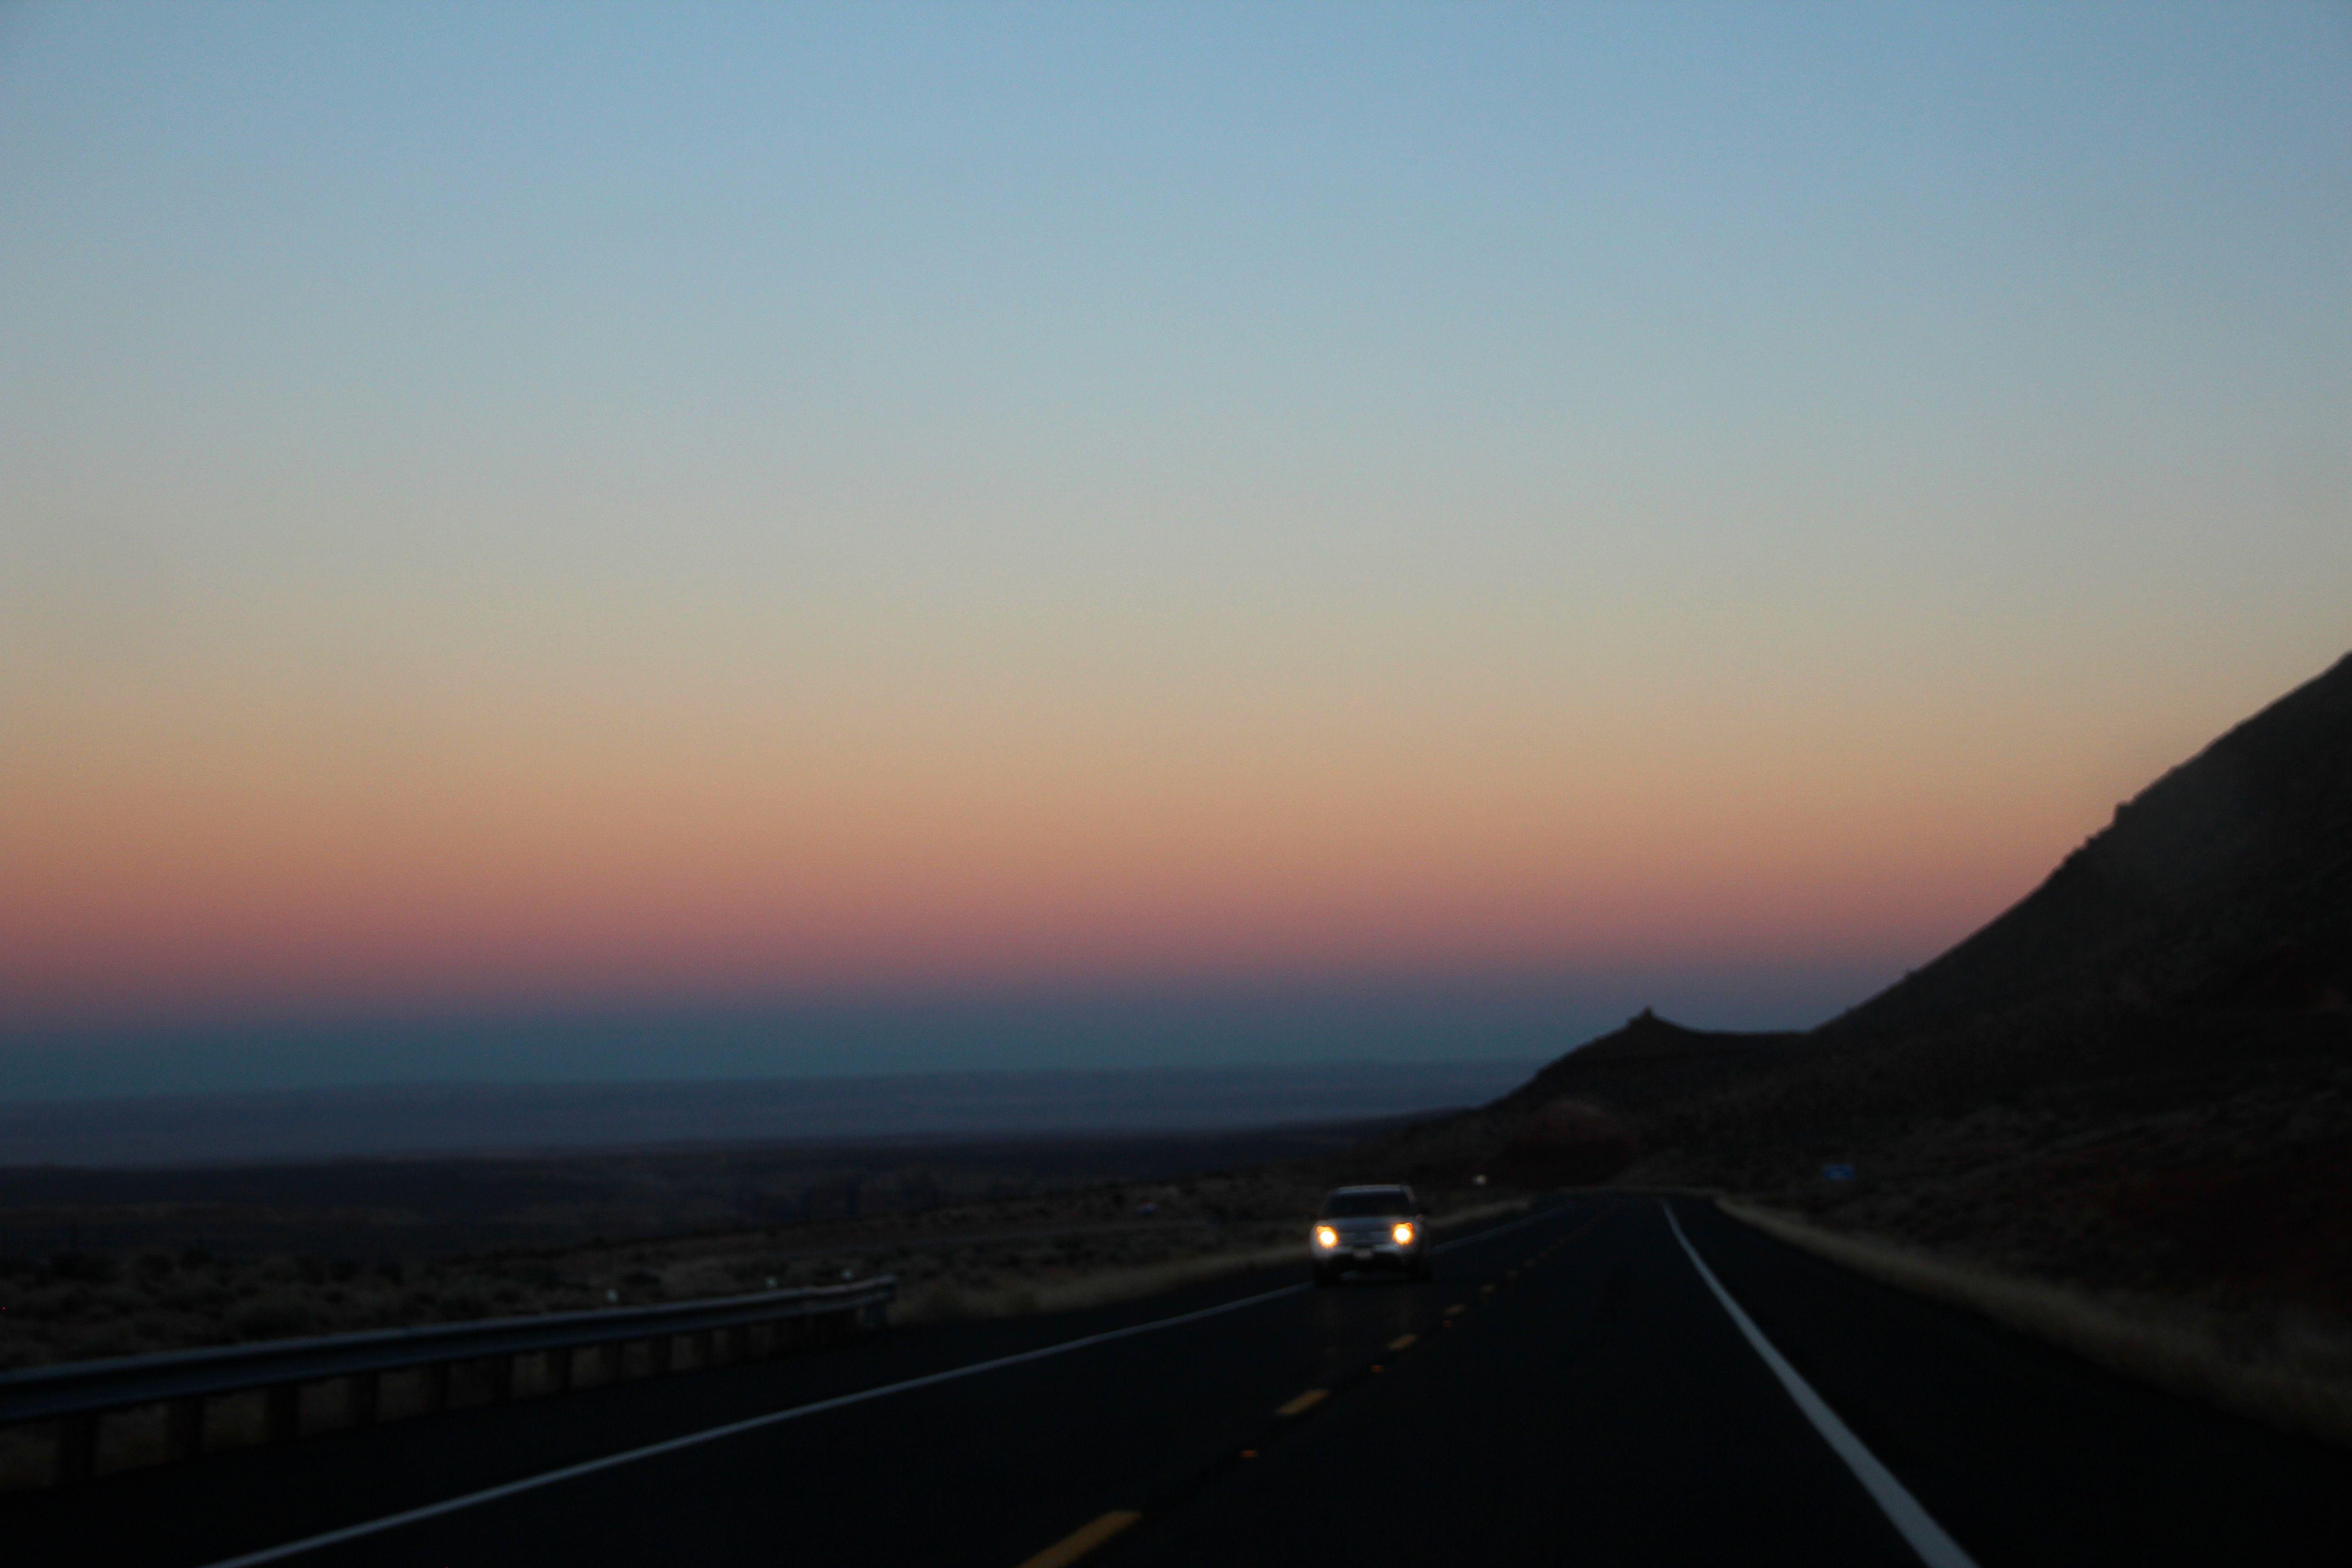 4 road trip sunset usa (c) upupup.fr